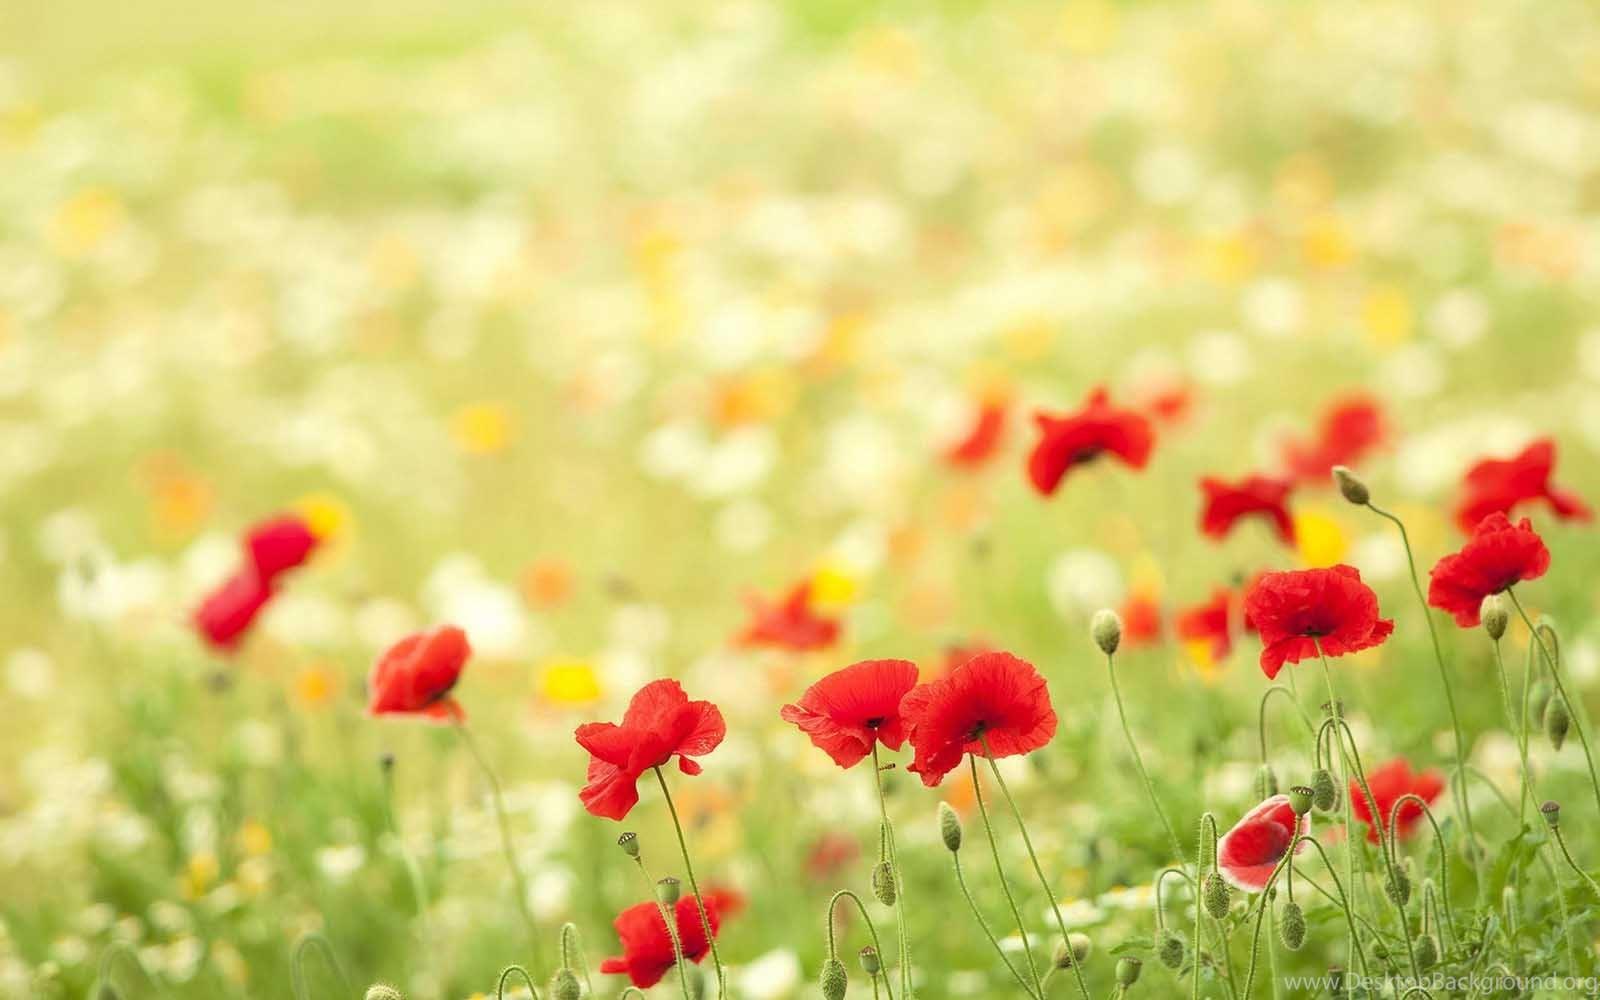 Beautiful flower scenery hd wallpapers for desktop desktop background original size 1118kb izmirmasajfo